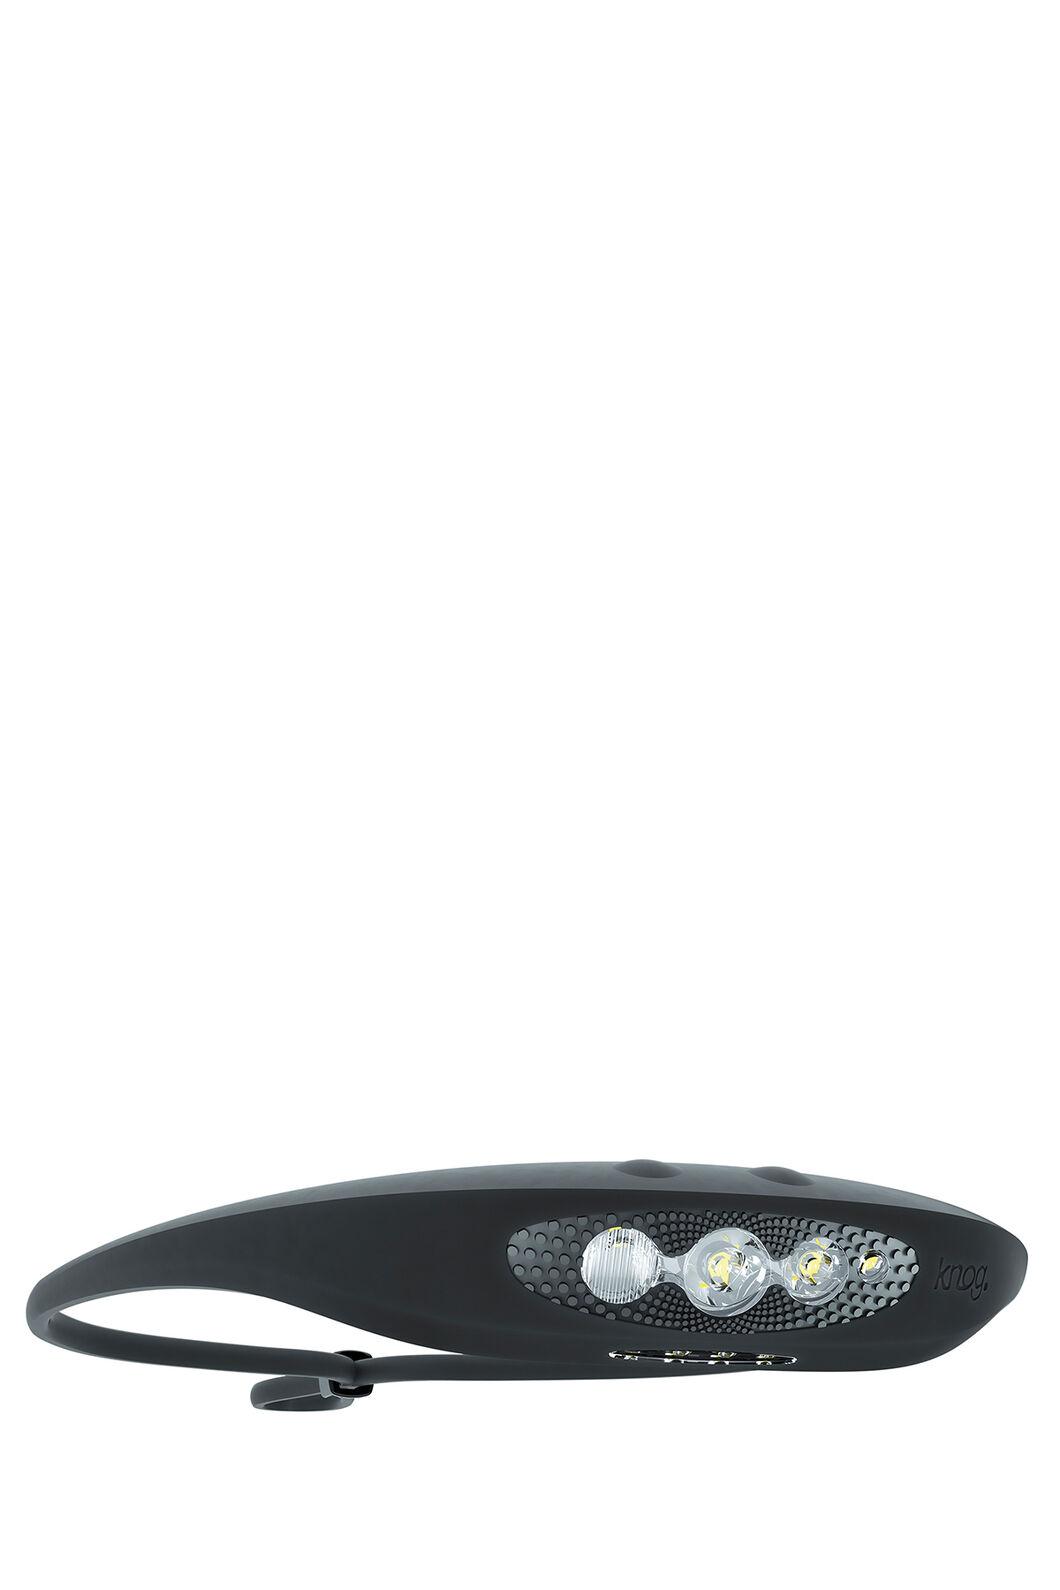 Knog Bilby Rechargeable Headlamp — 400 Lumens, Black, hi-res